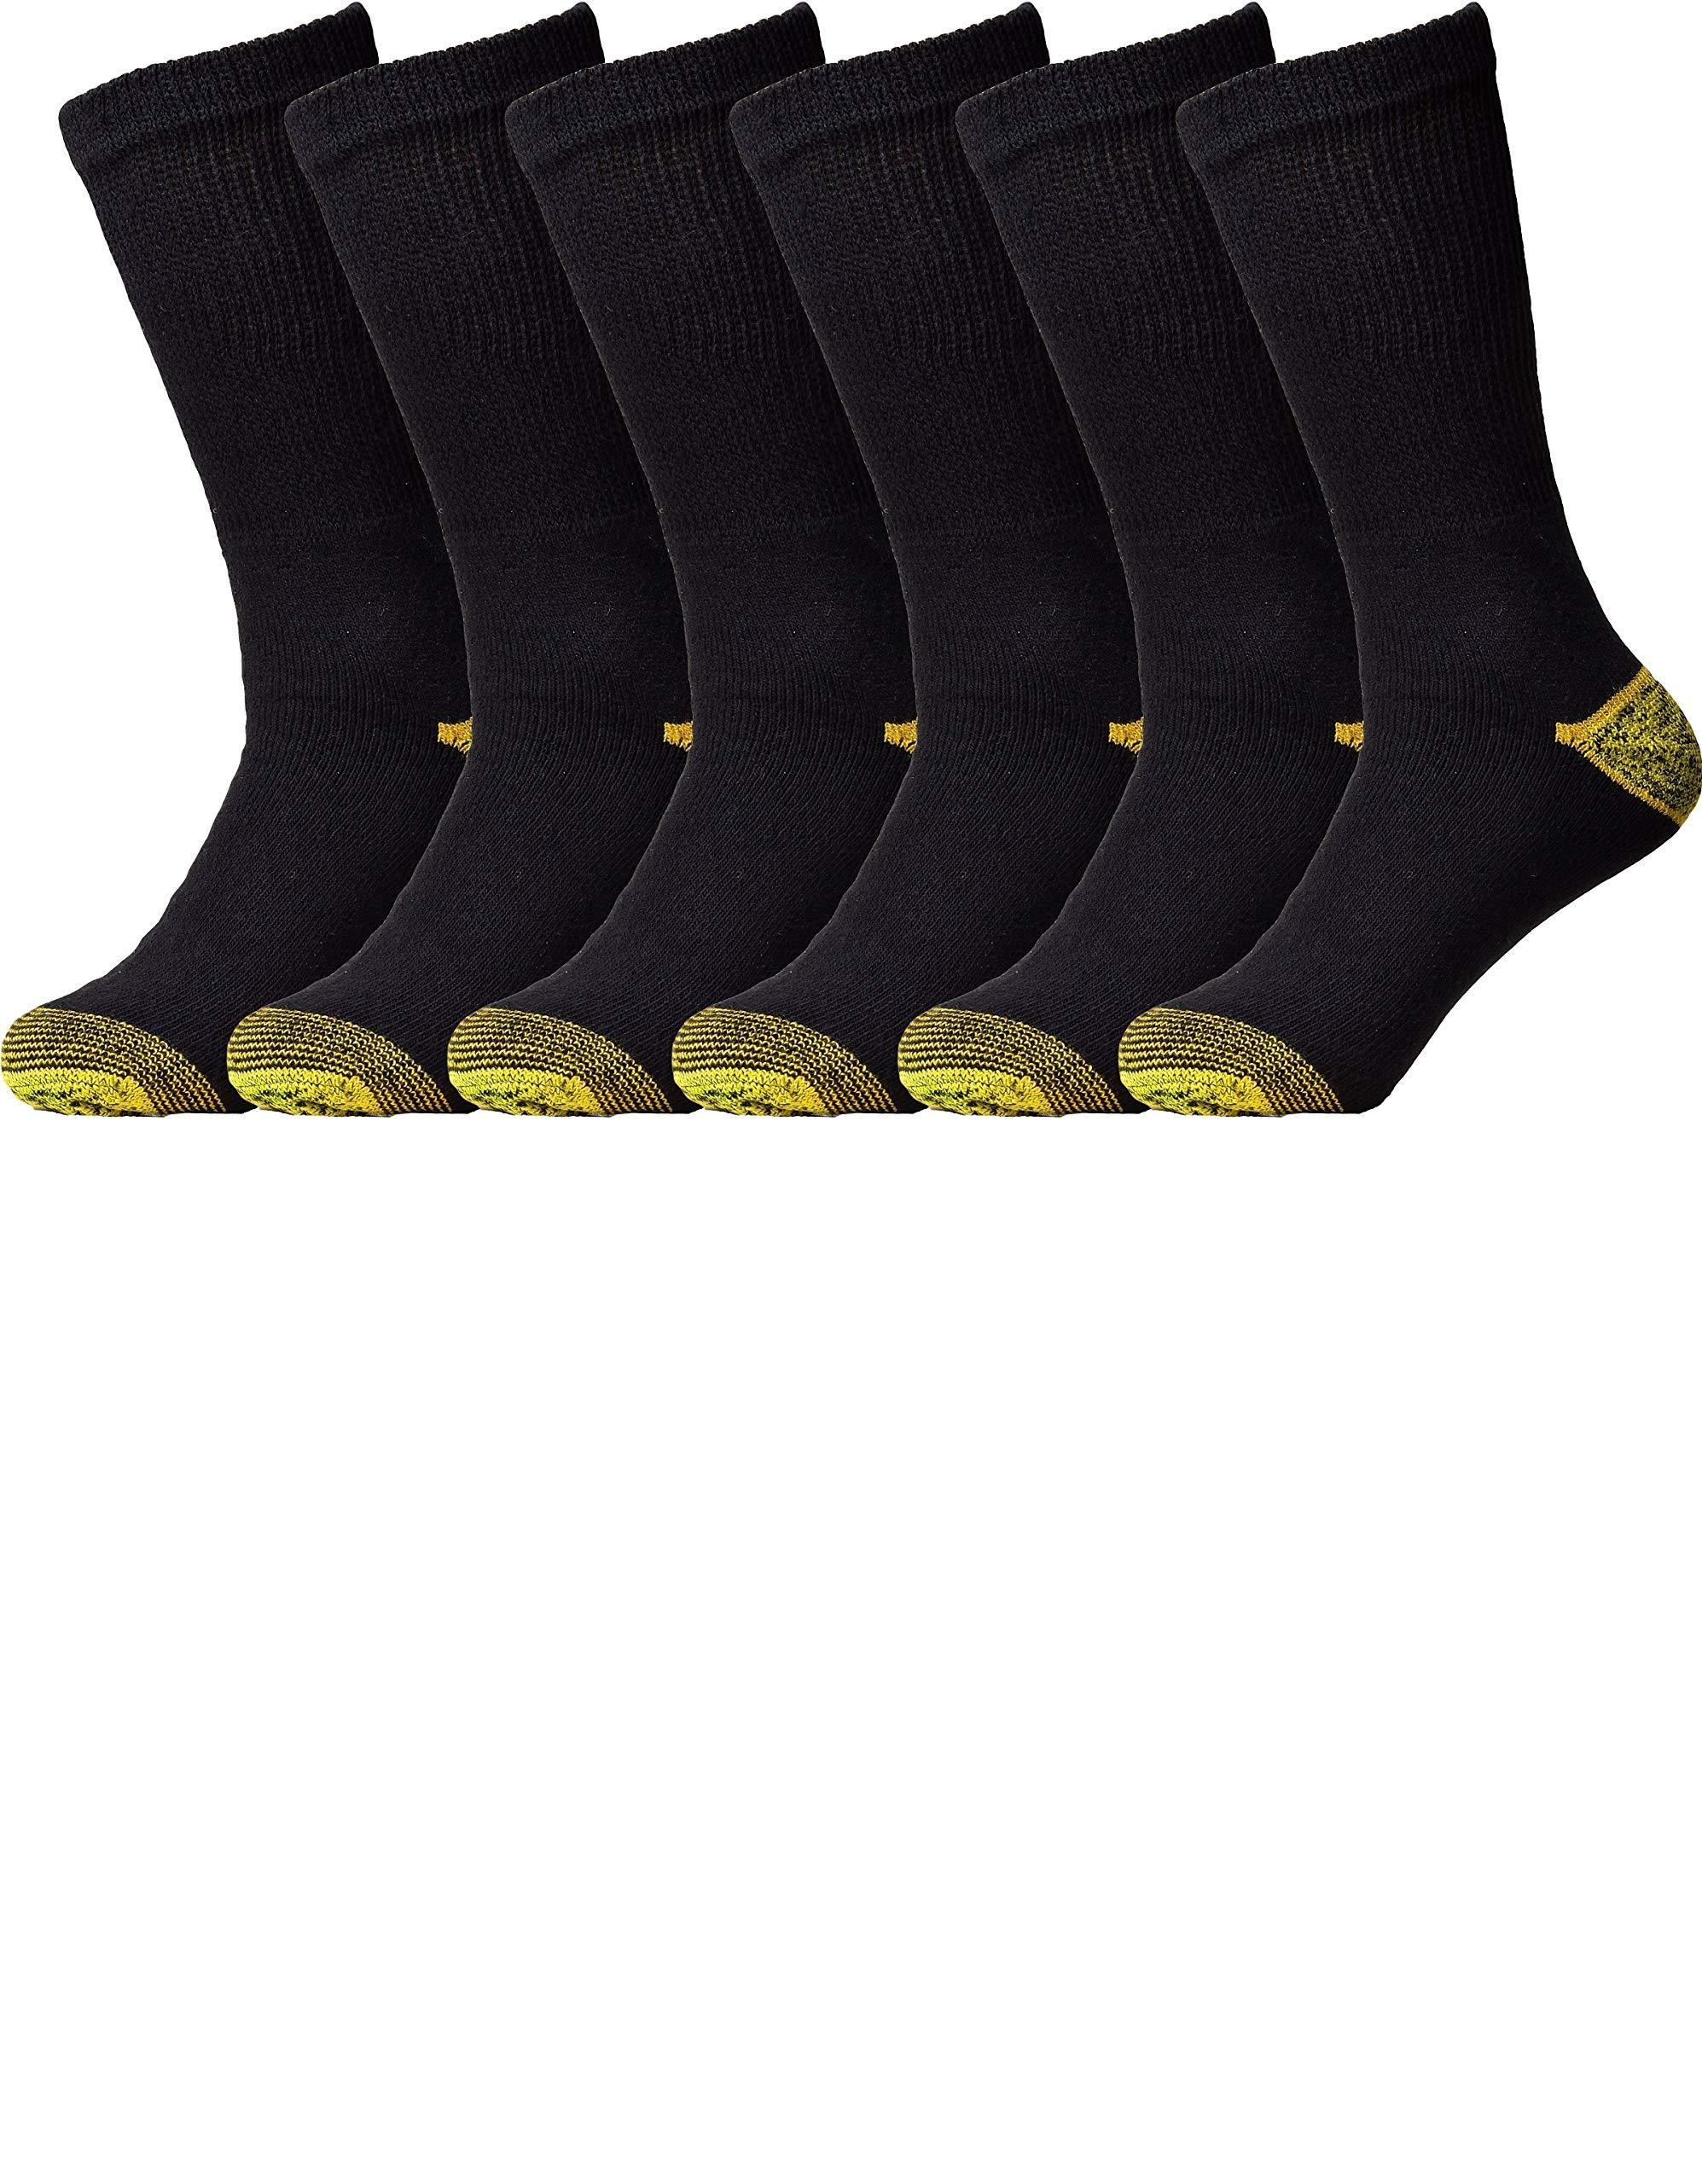 Mens Crew Socks 6 Pack All-Season Cotton Crew Athletic Work Socks (10-13, 6 Pack Black)